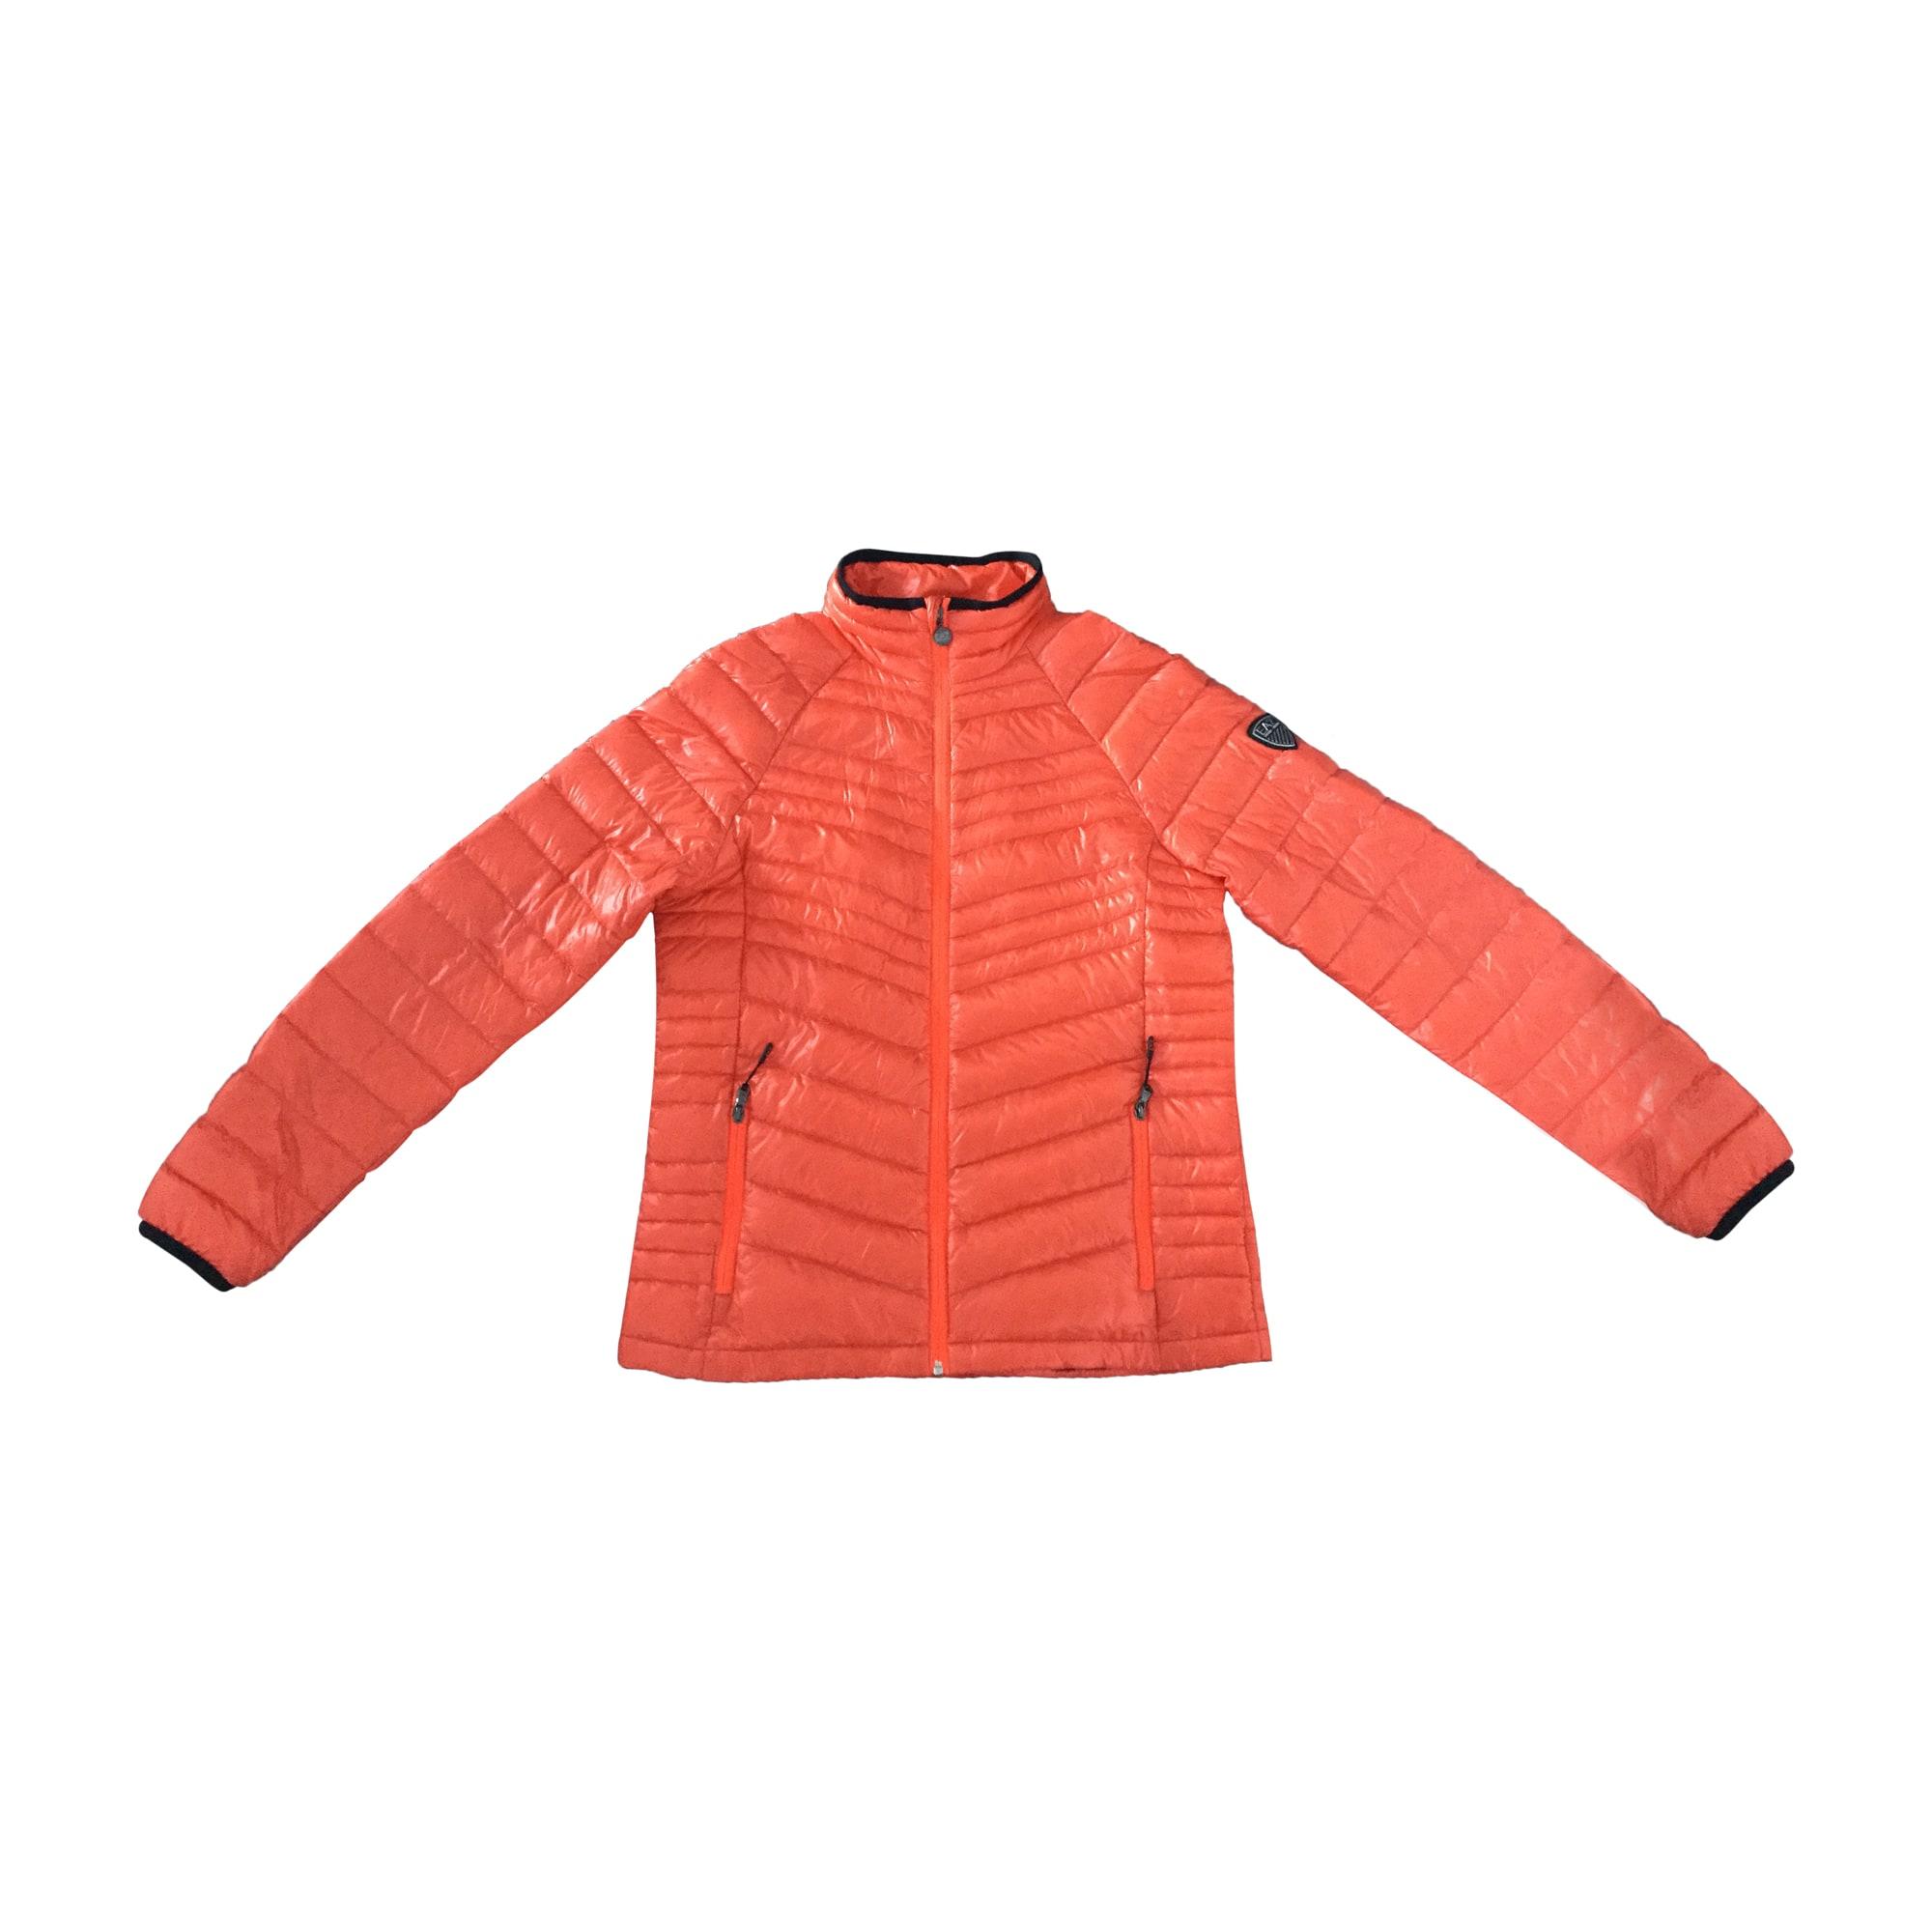 9798dcae12c Doudoune ARMANI EA7 52 (L) orange - 7112585